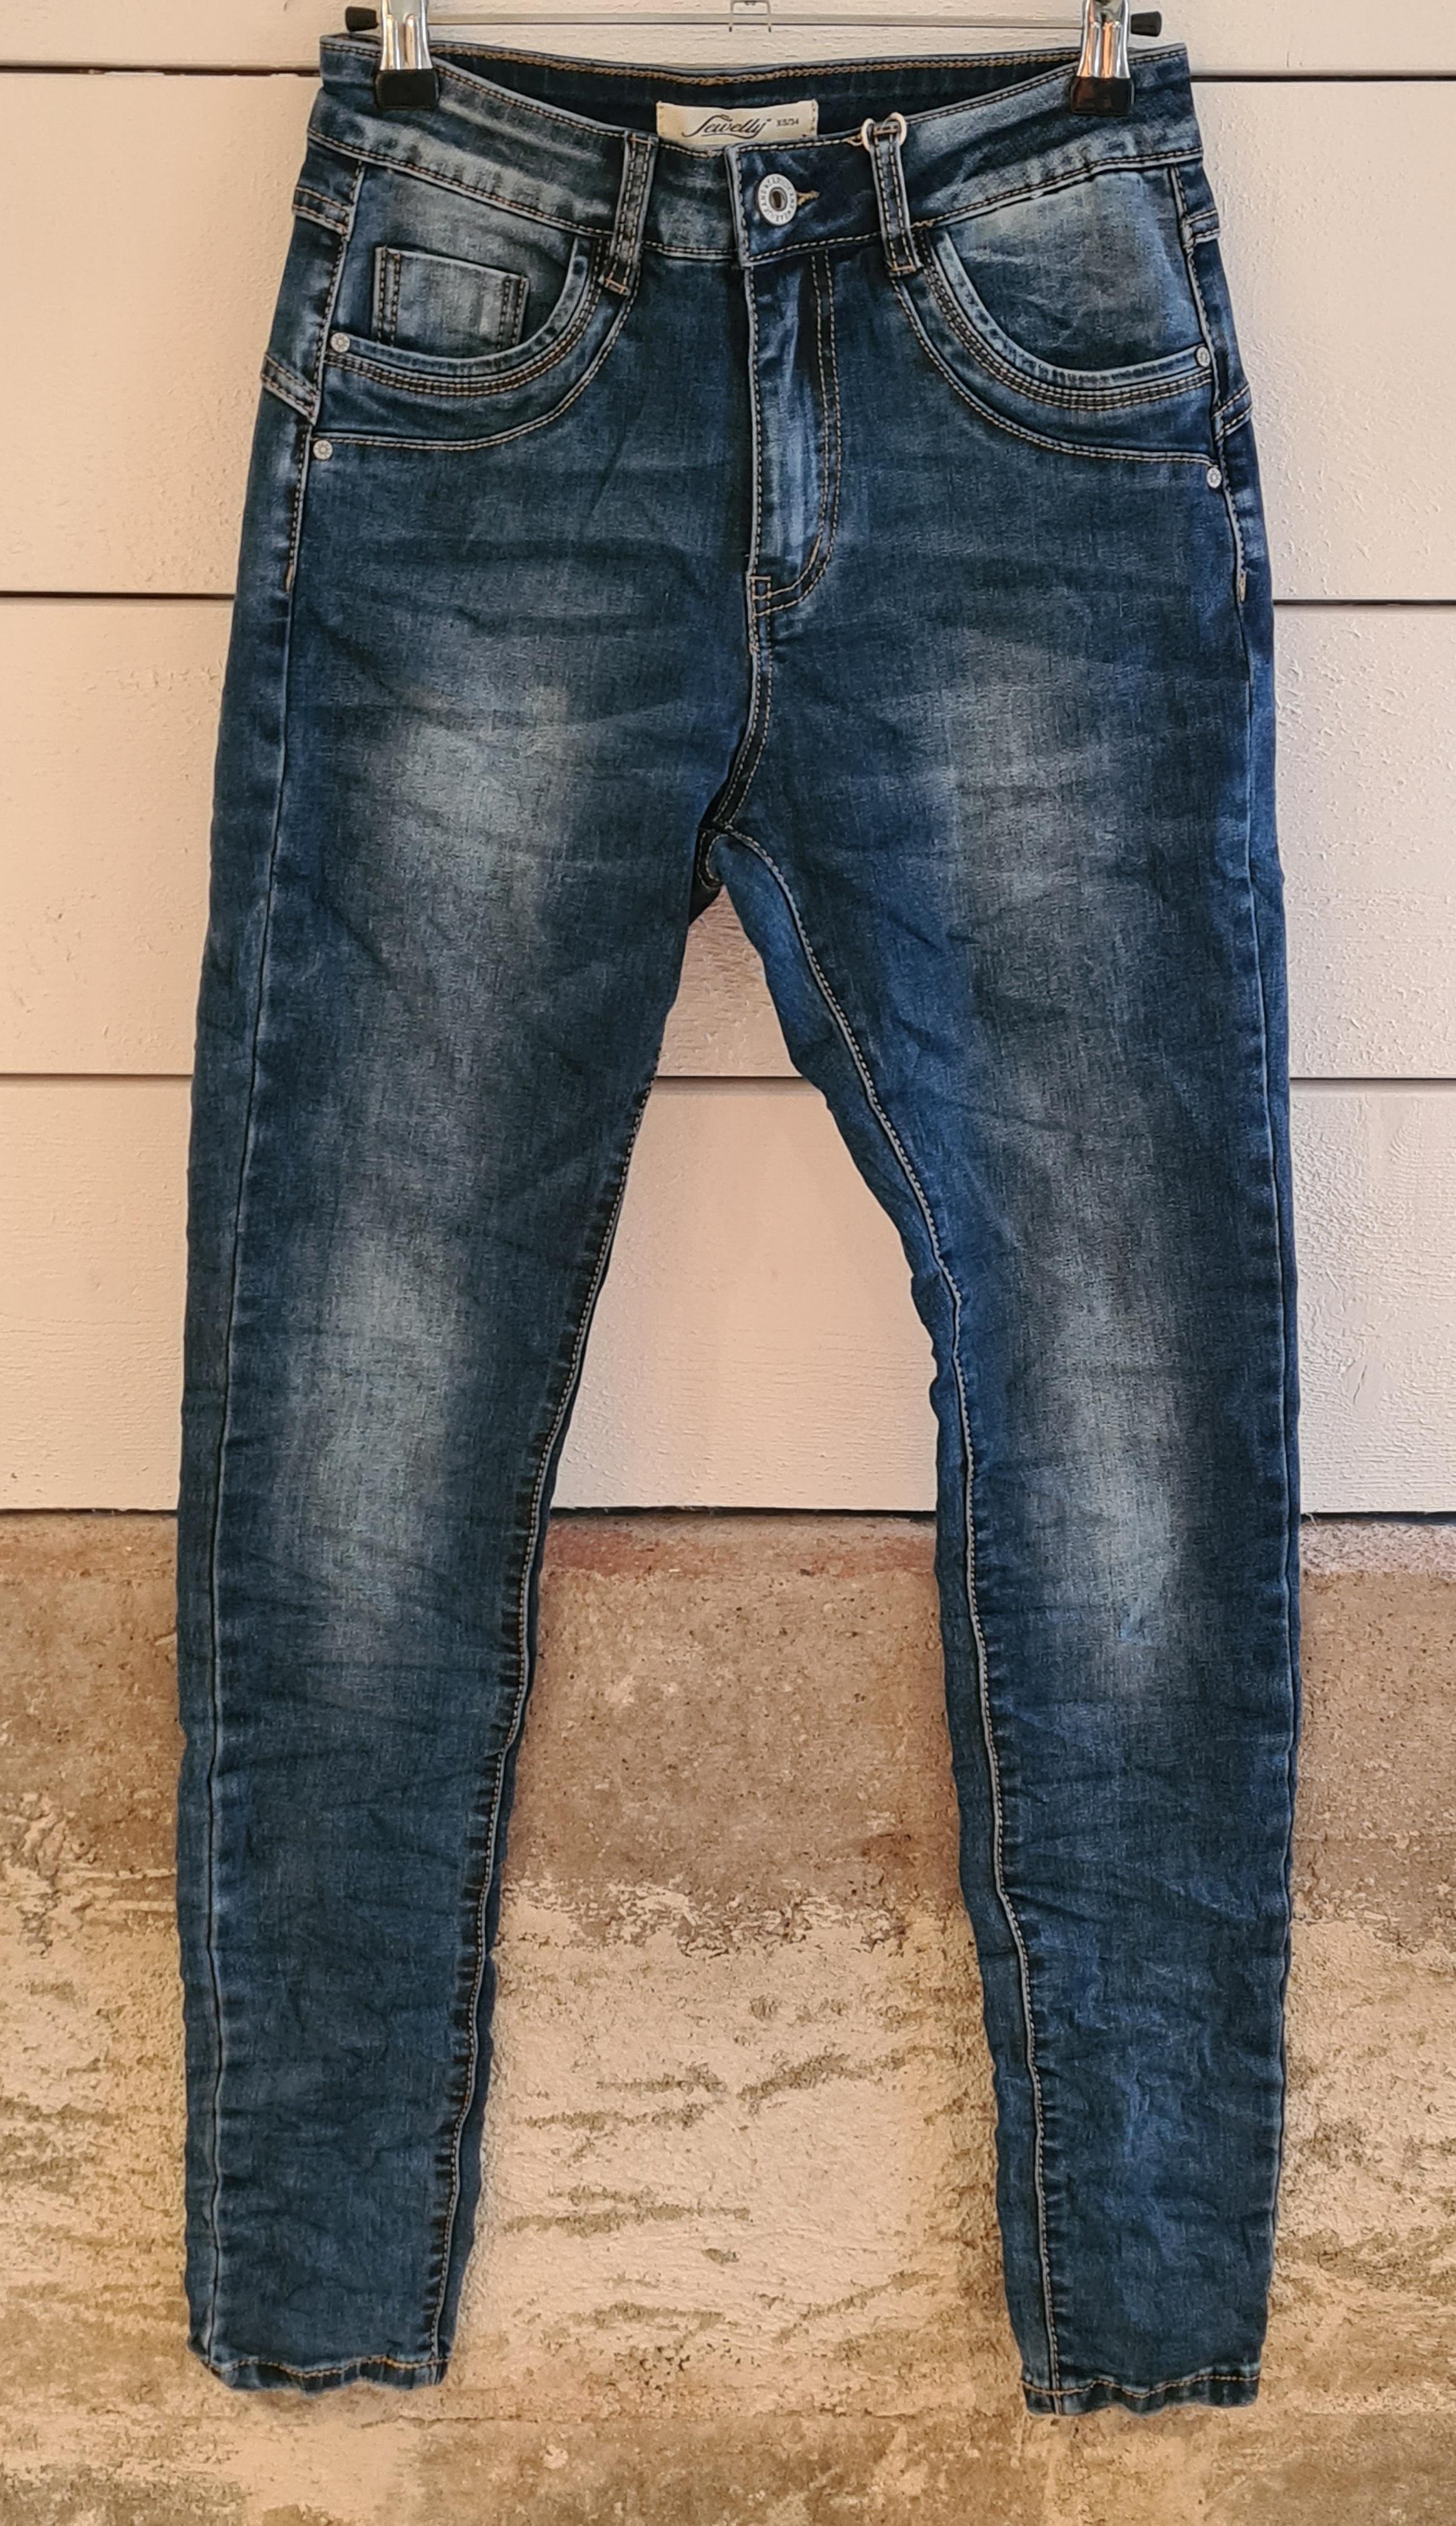 Jeans tvättadblå m zipgylf